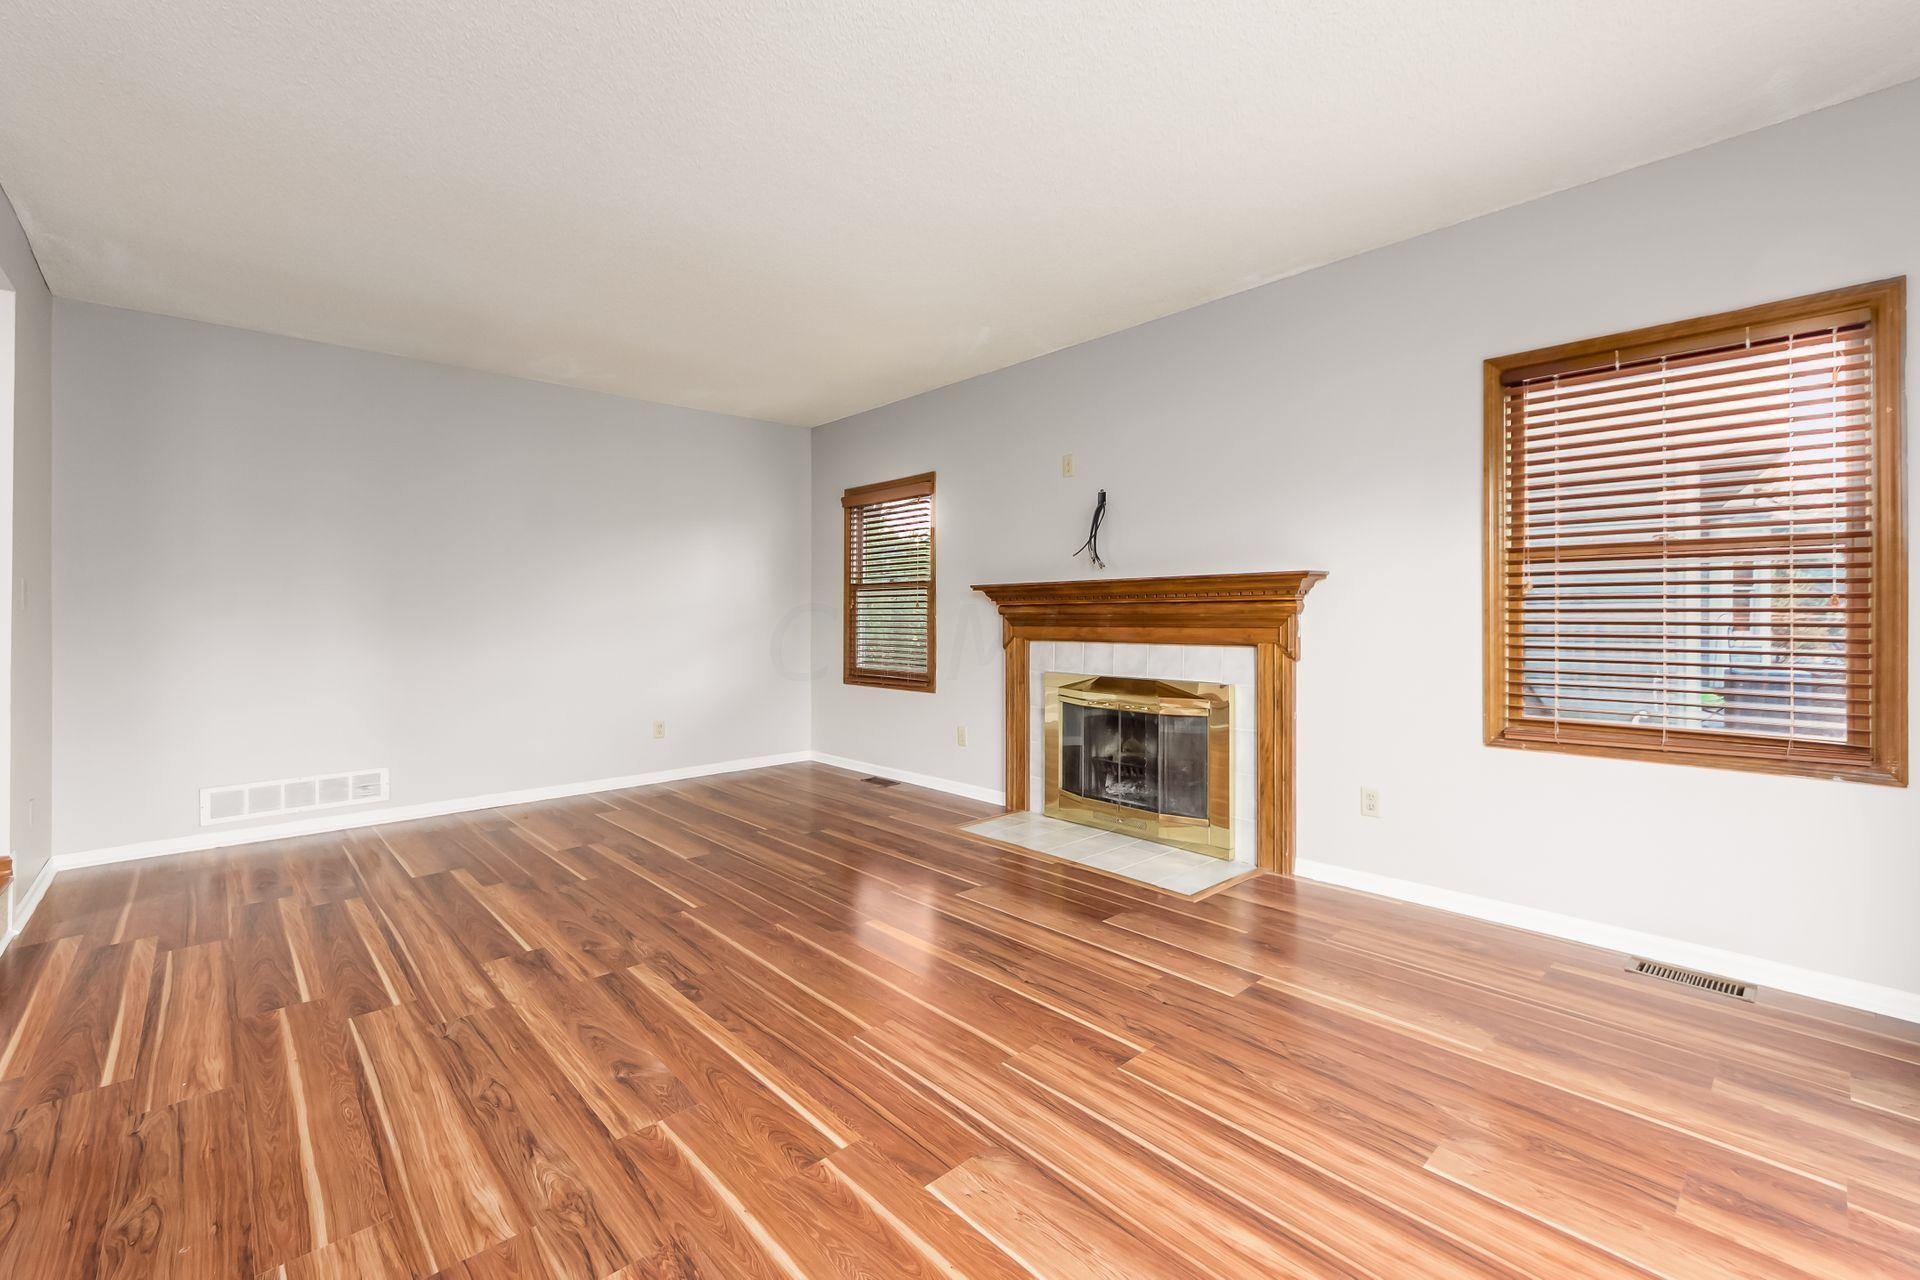 7553 Bardston Drive, Dublin, Ohio 43017, 4 Bedrooms Bedrooms, ,3 BathroomsBathrooms,Residential,For Sale,Bardston,220039505